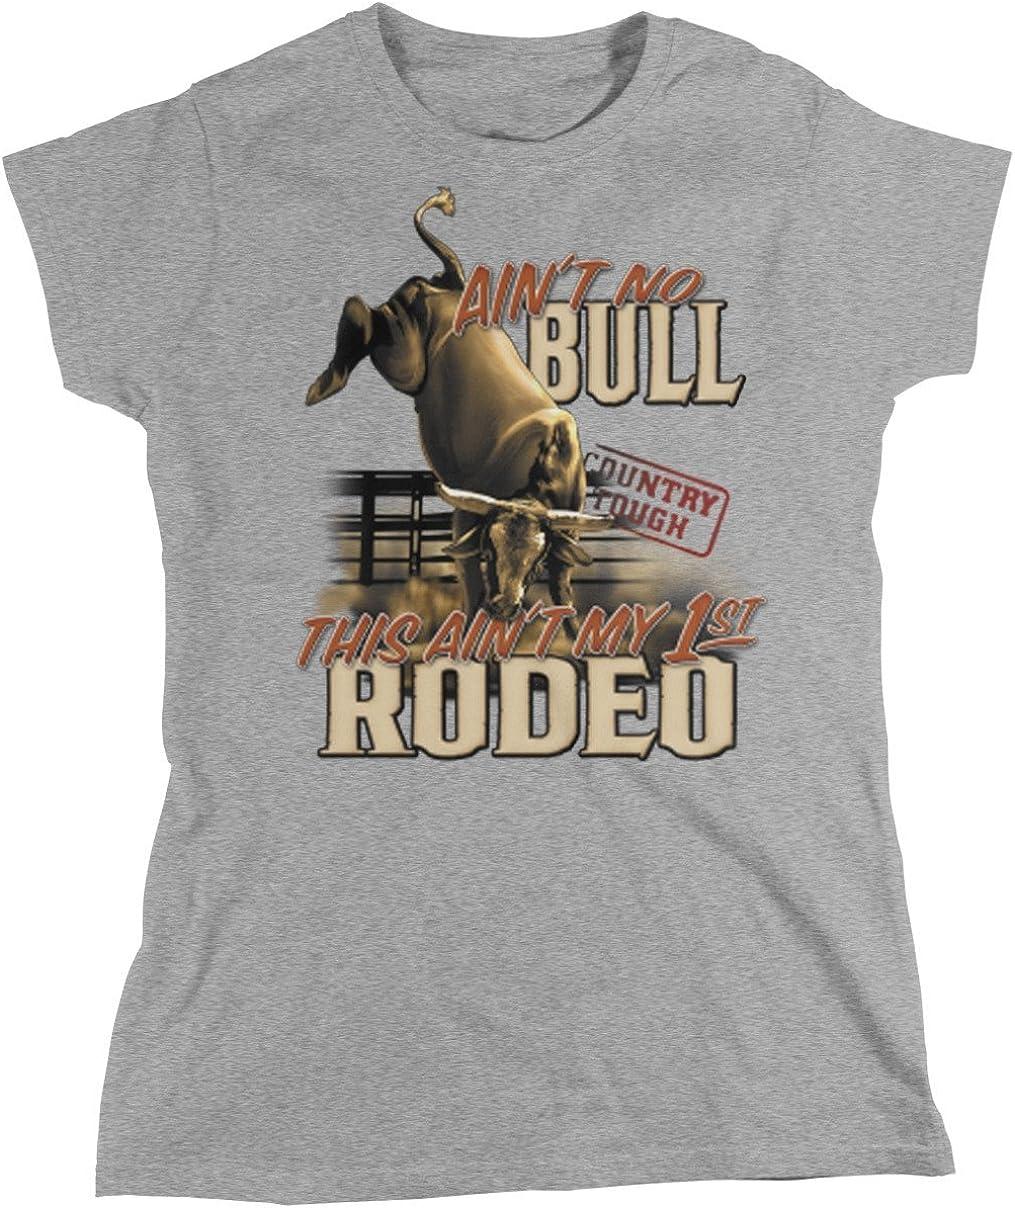 Amdesco Aint No Bull, Country Tough, Rodeo - Camiseta para Mujer - - XX-Large: Amazon.es: Ropa y accesorios